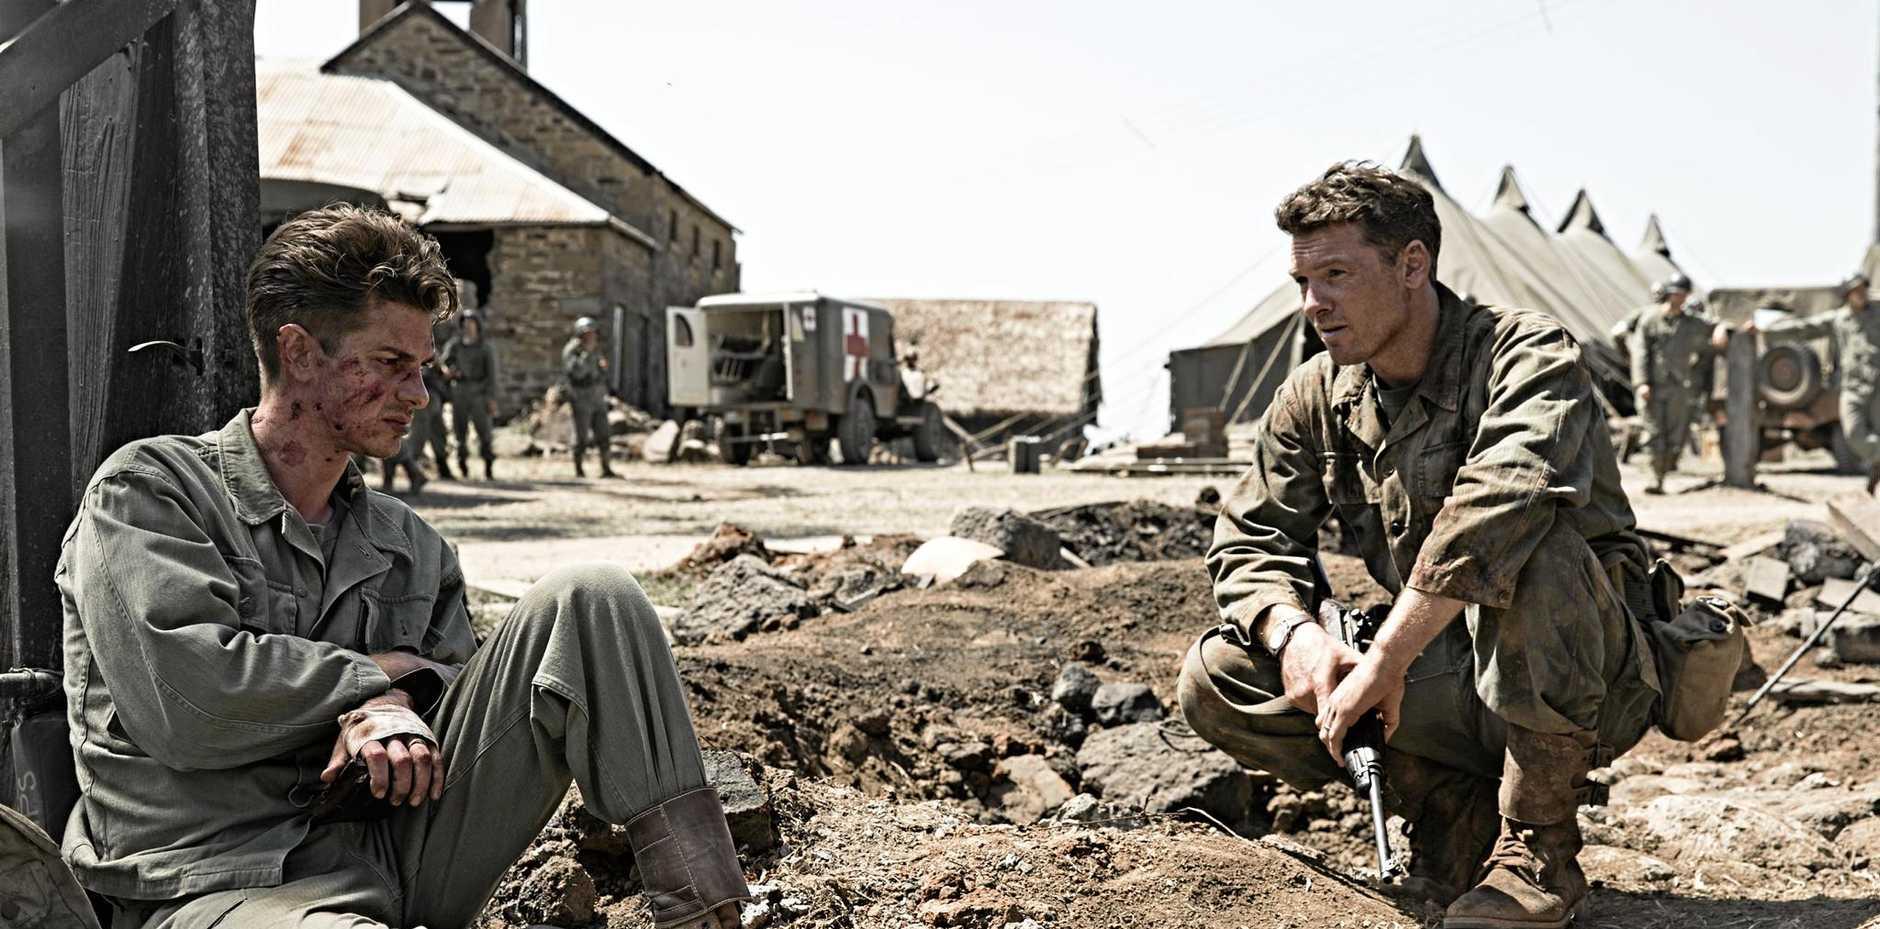 Andrew Garfield and Sam Worthington in a scene from the movie Hacksaw Ridge.